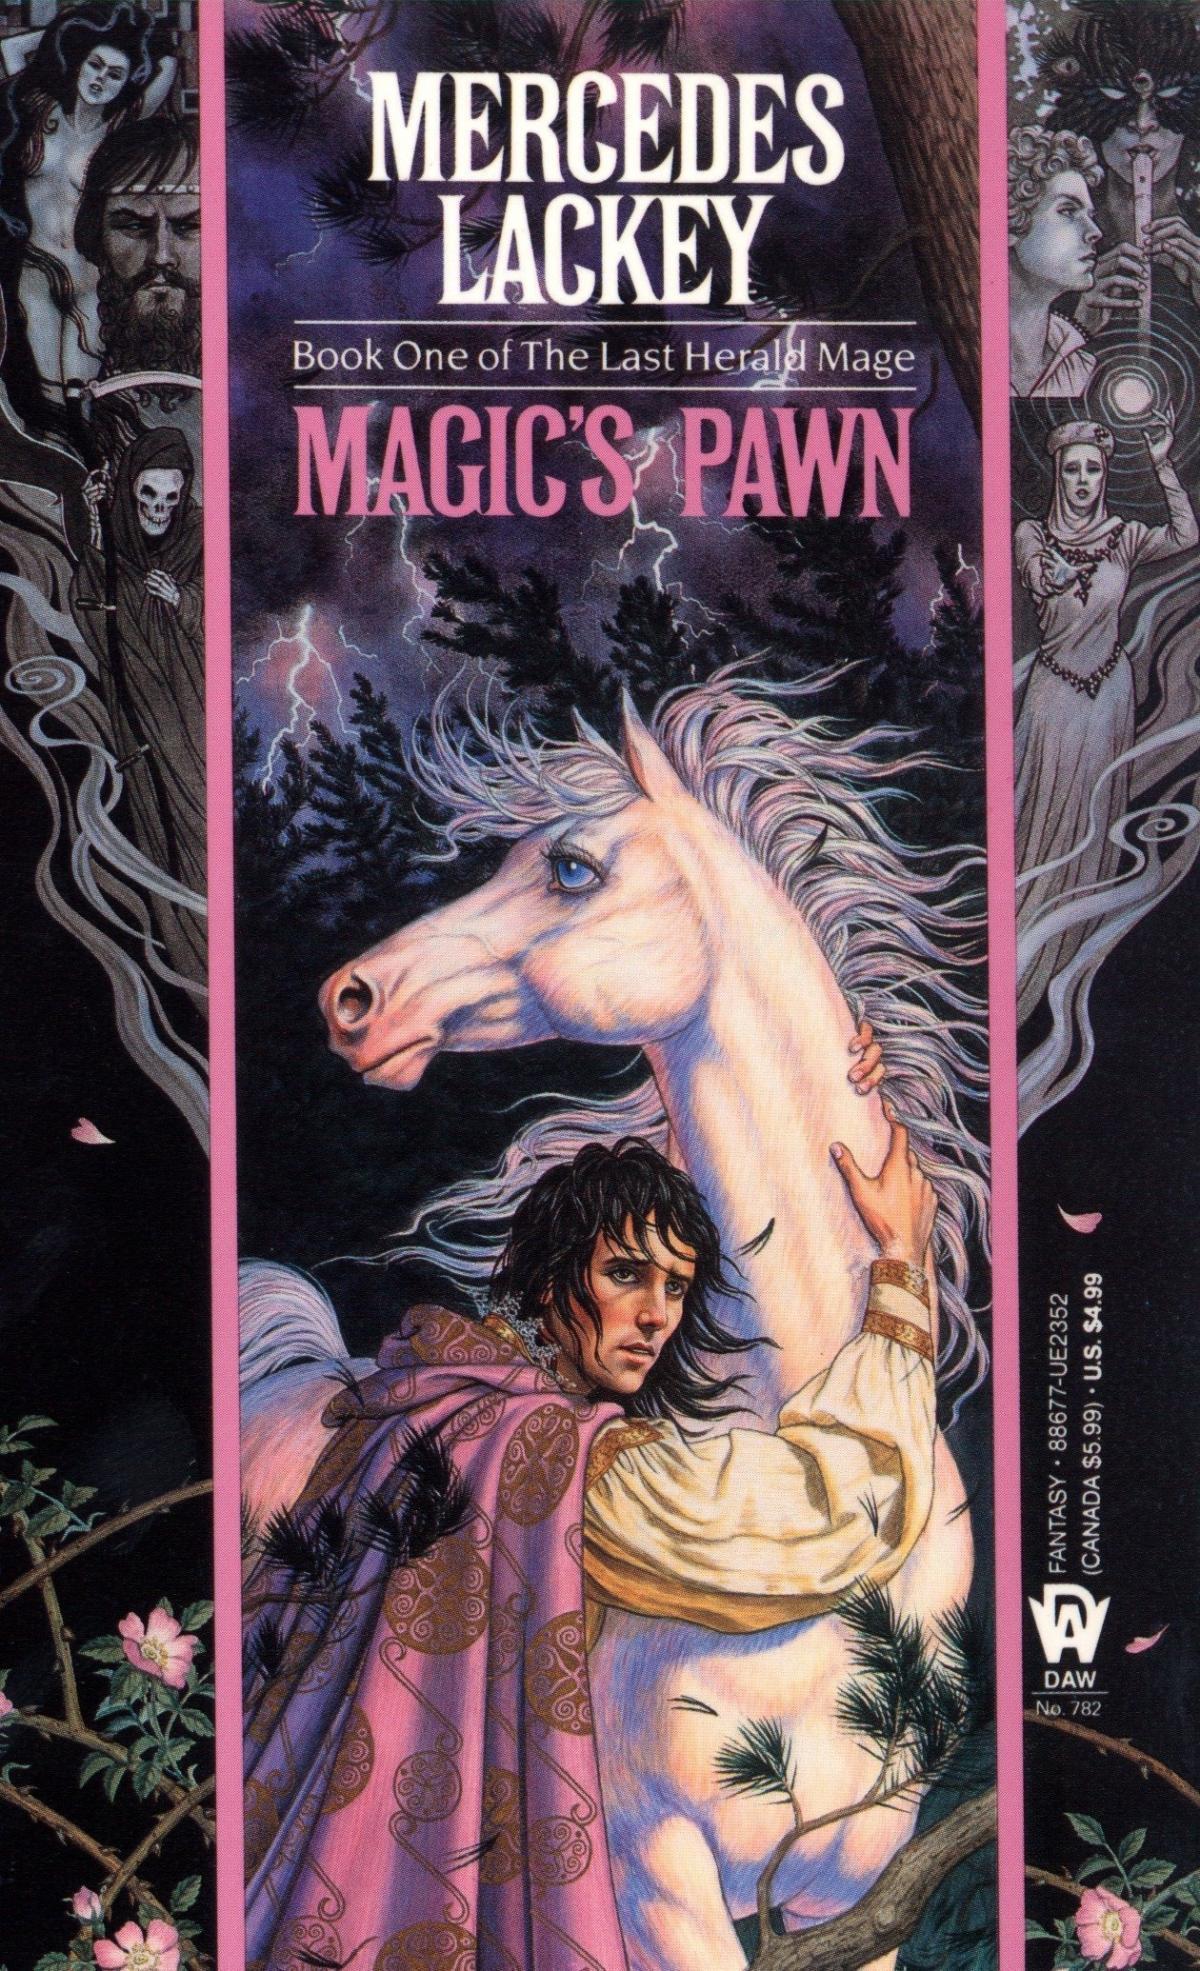 Magic's Pawn, by Mercedes Lackey